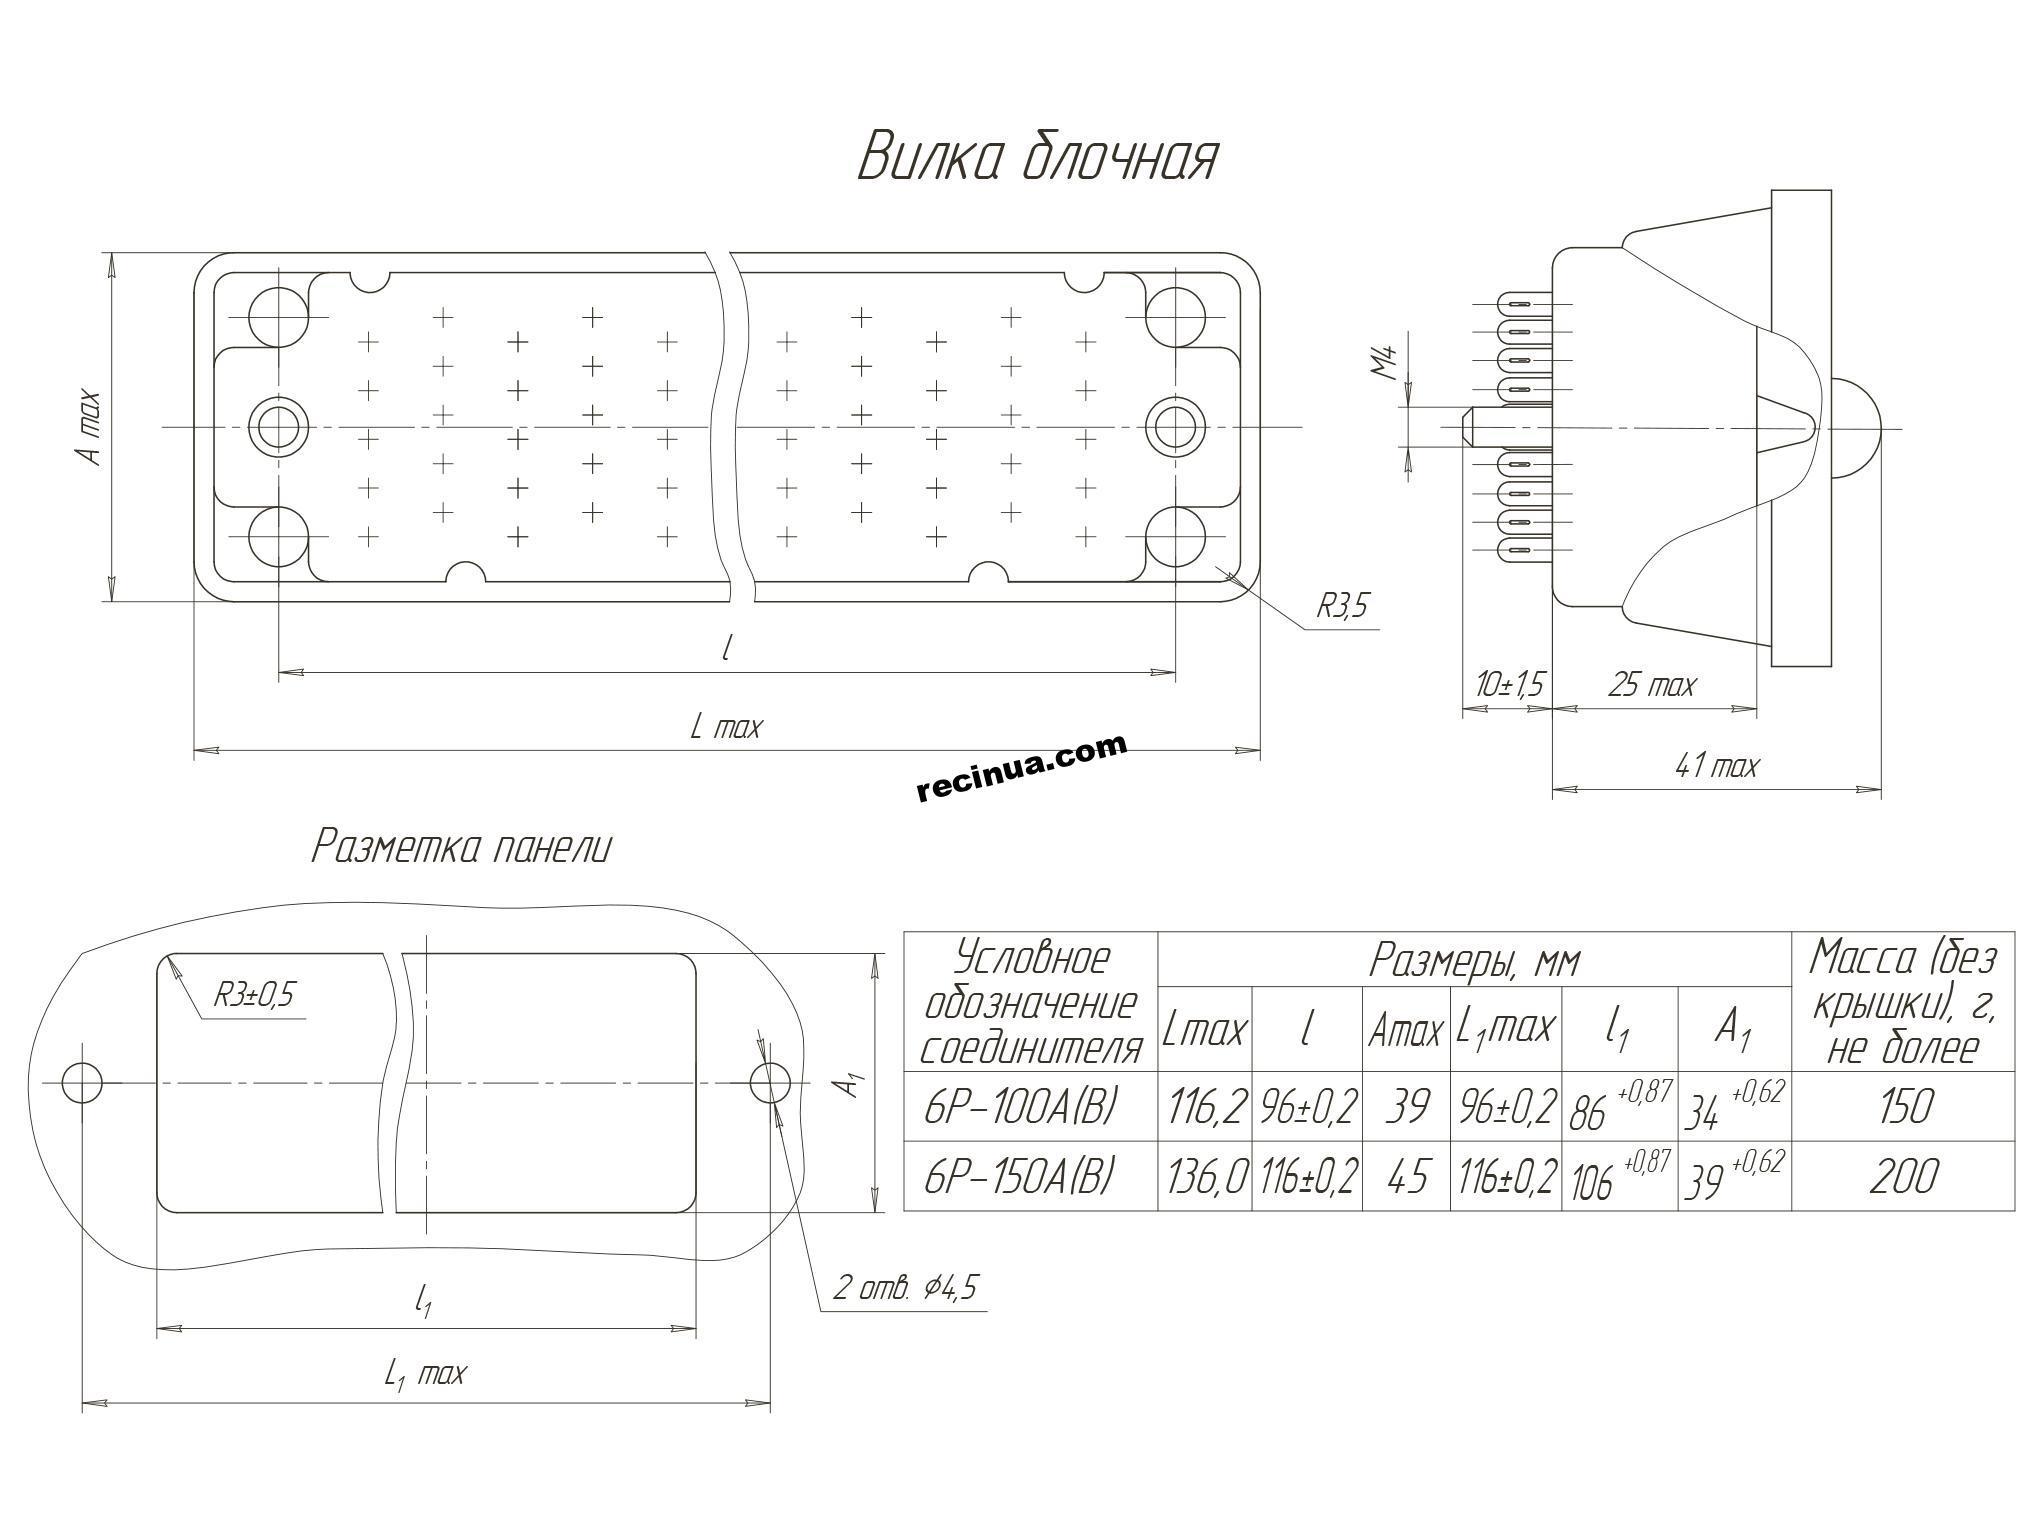 вилка кабельная 6Р-100А (В6Р-100А)